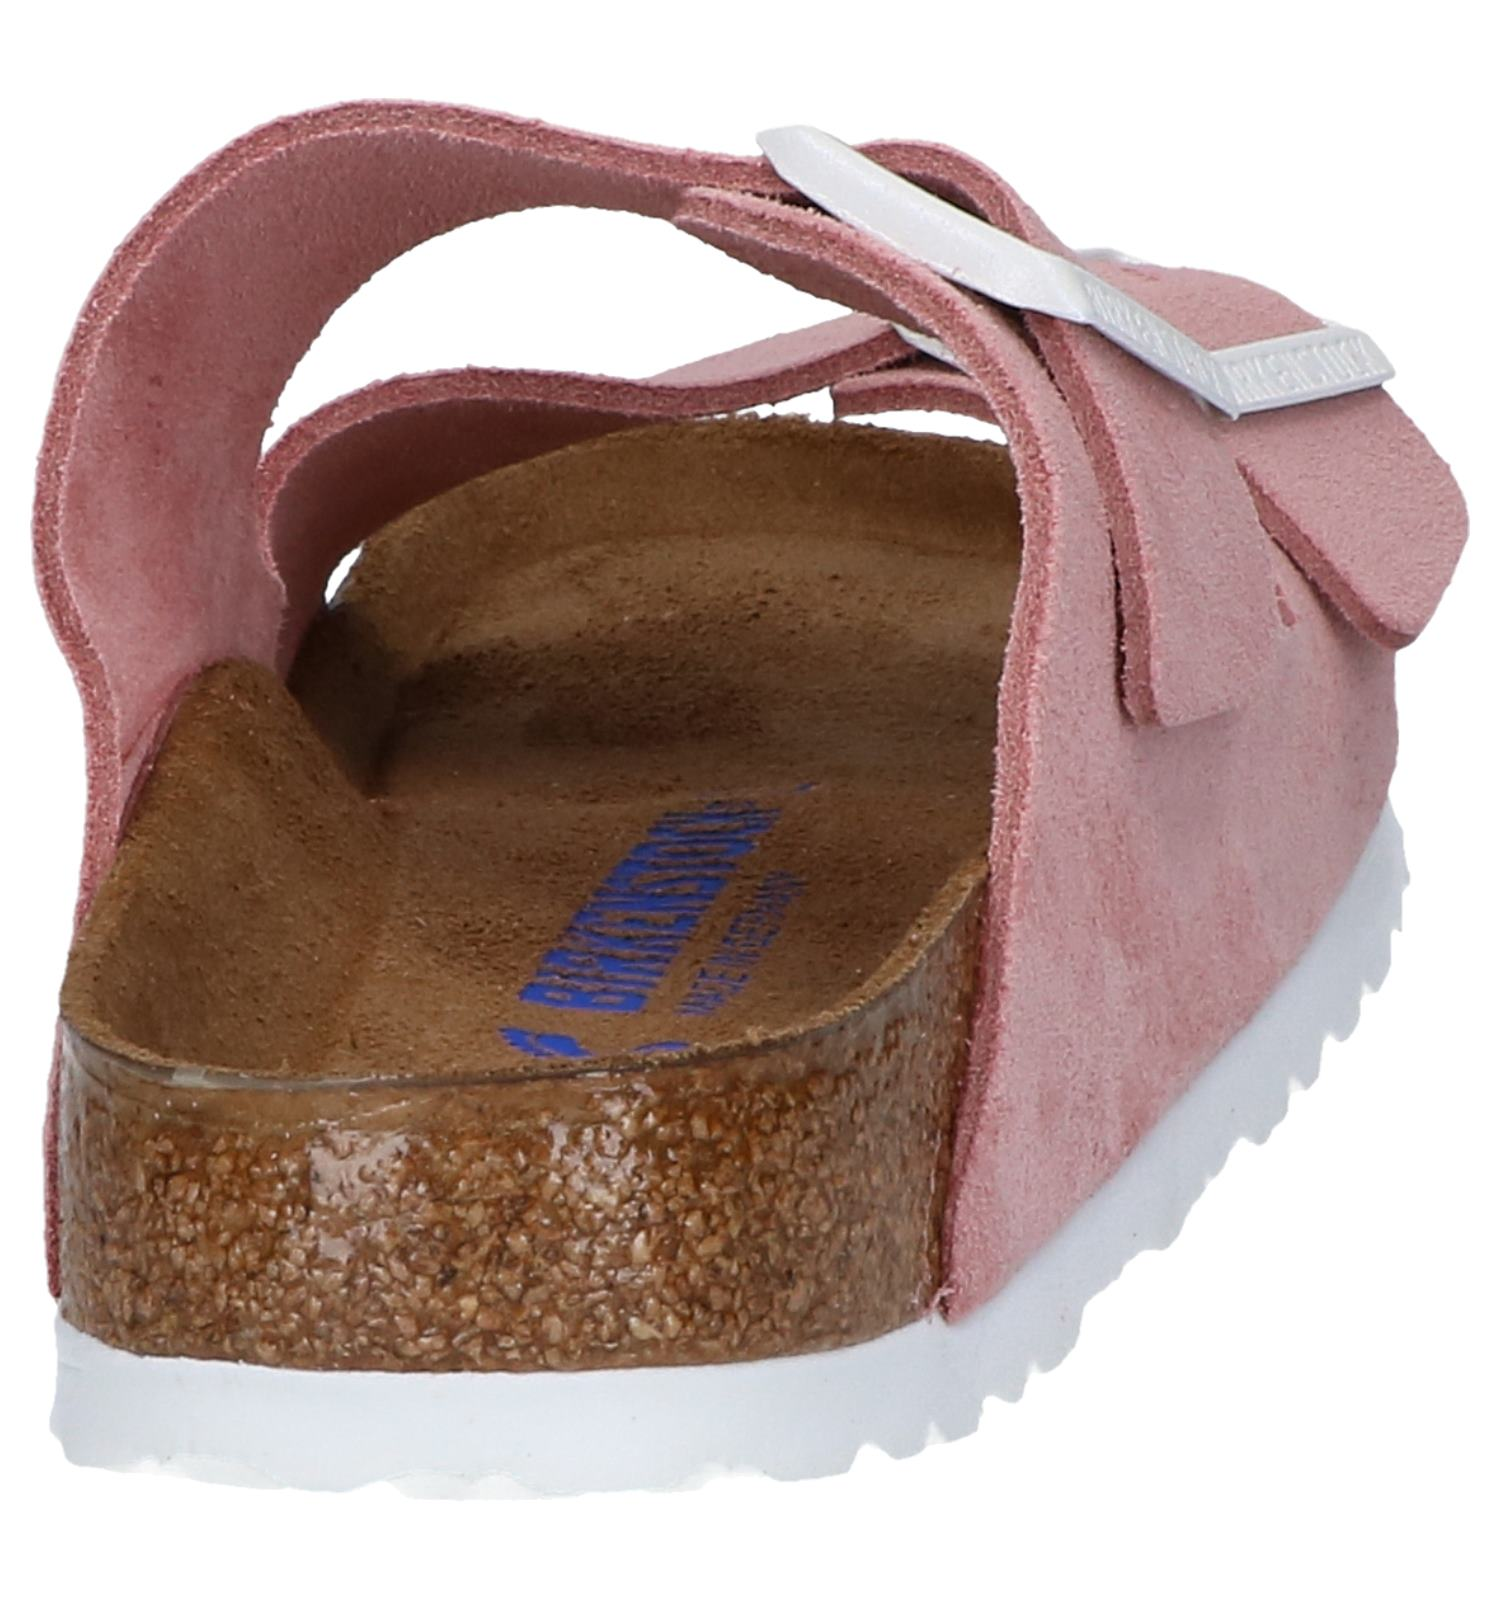 Arizona Birkenstock Slippers Roze Roze Arizona Slippers Roze Birkenstock Slippers QCrxshtdB